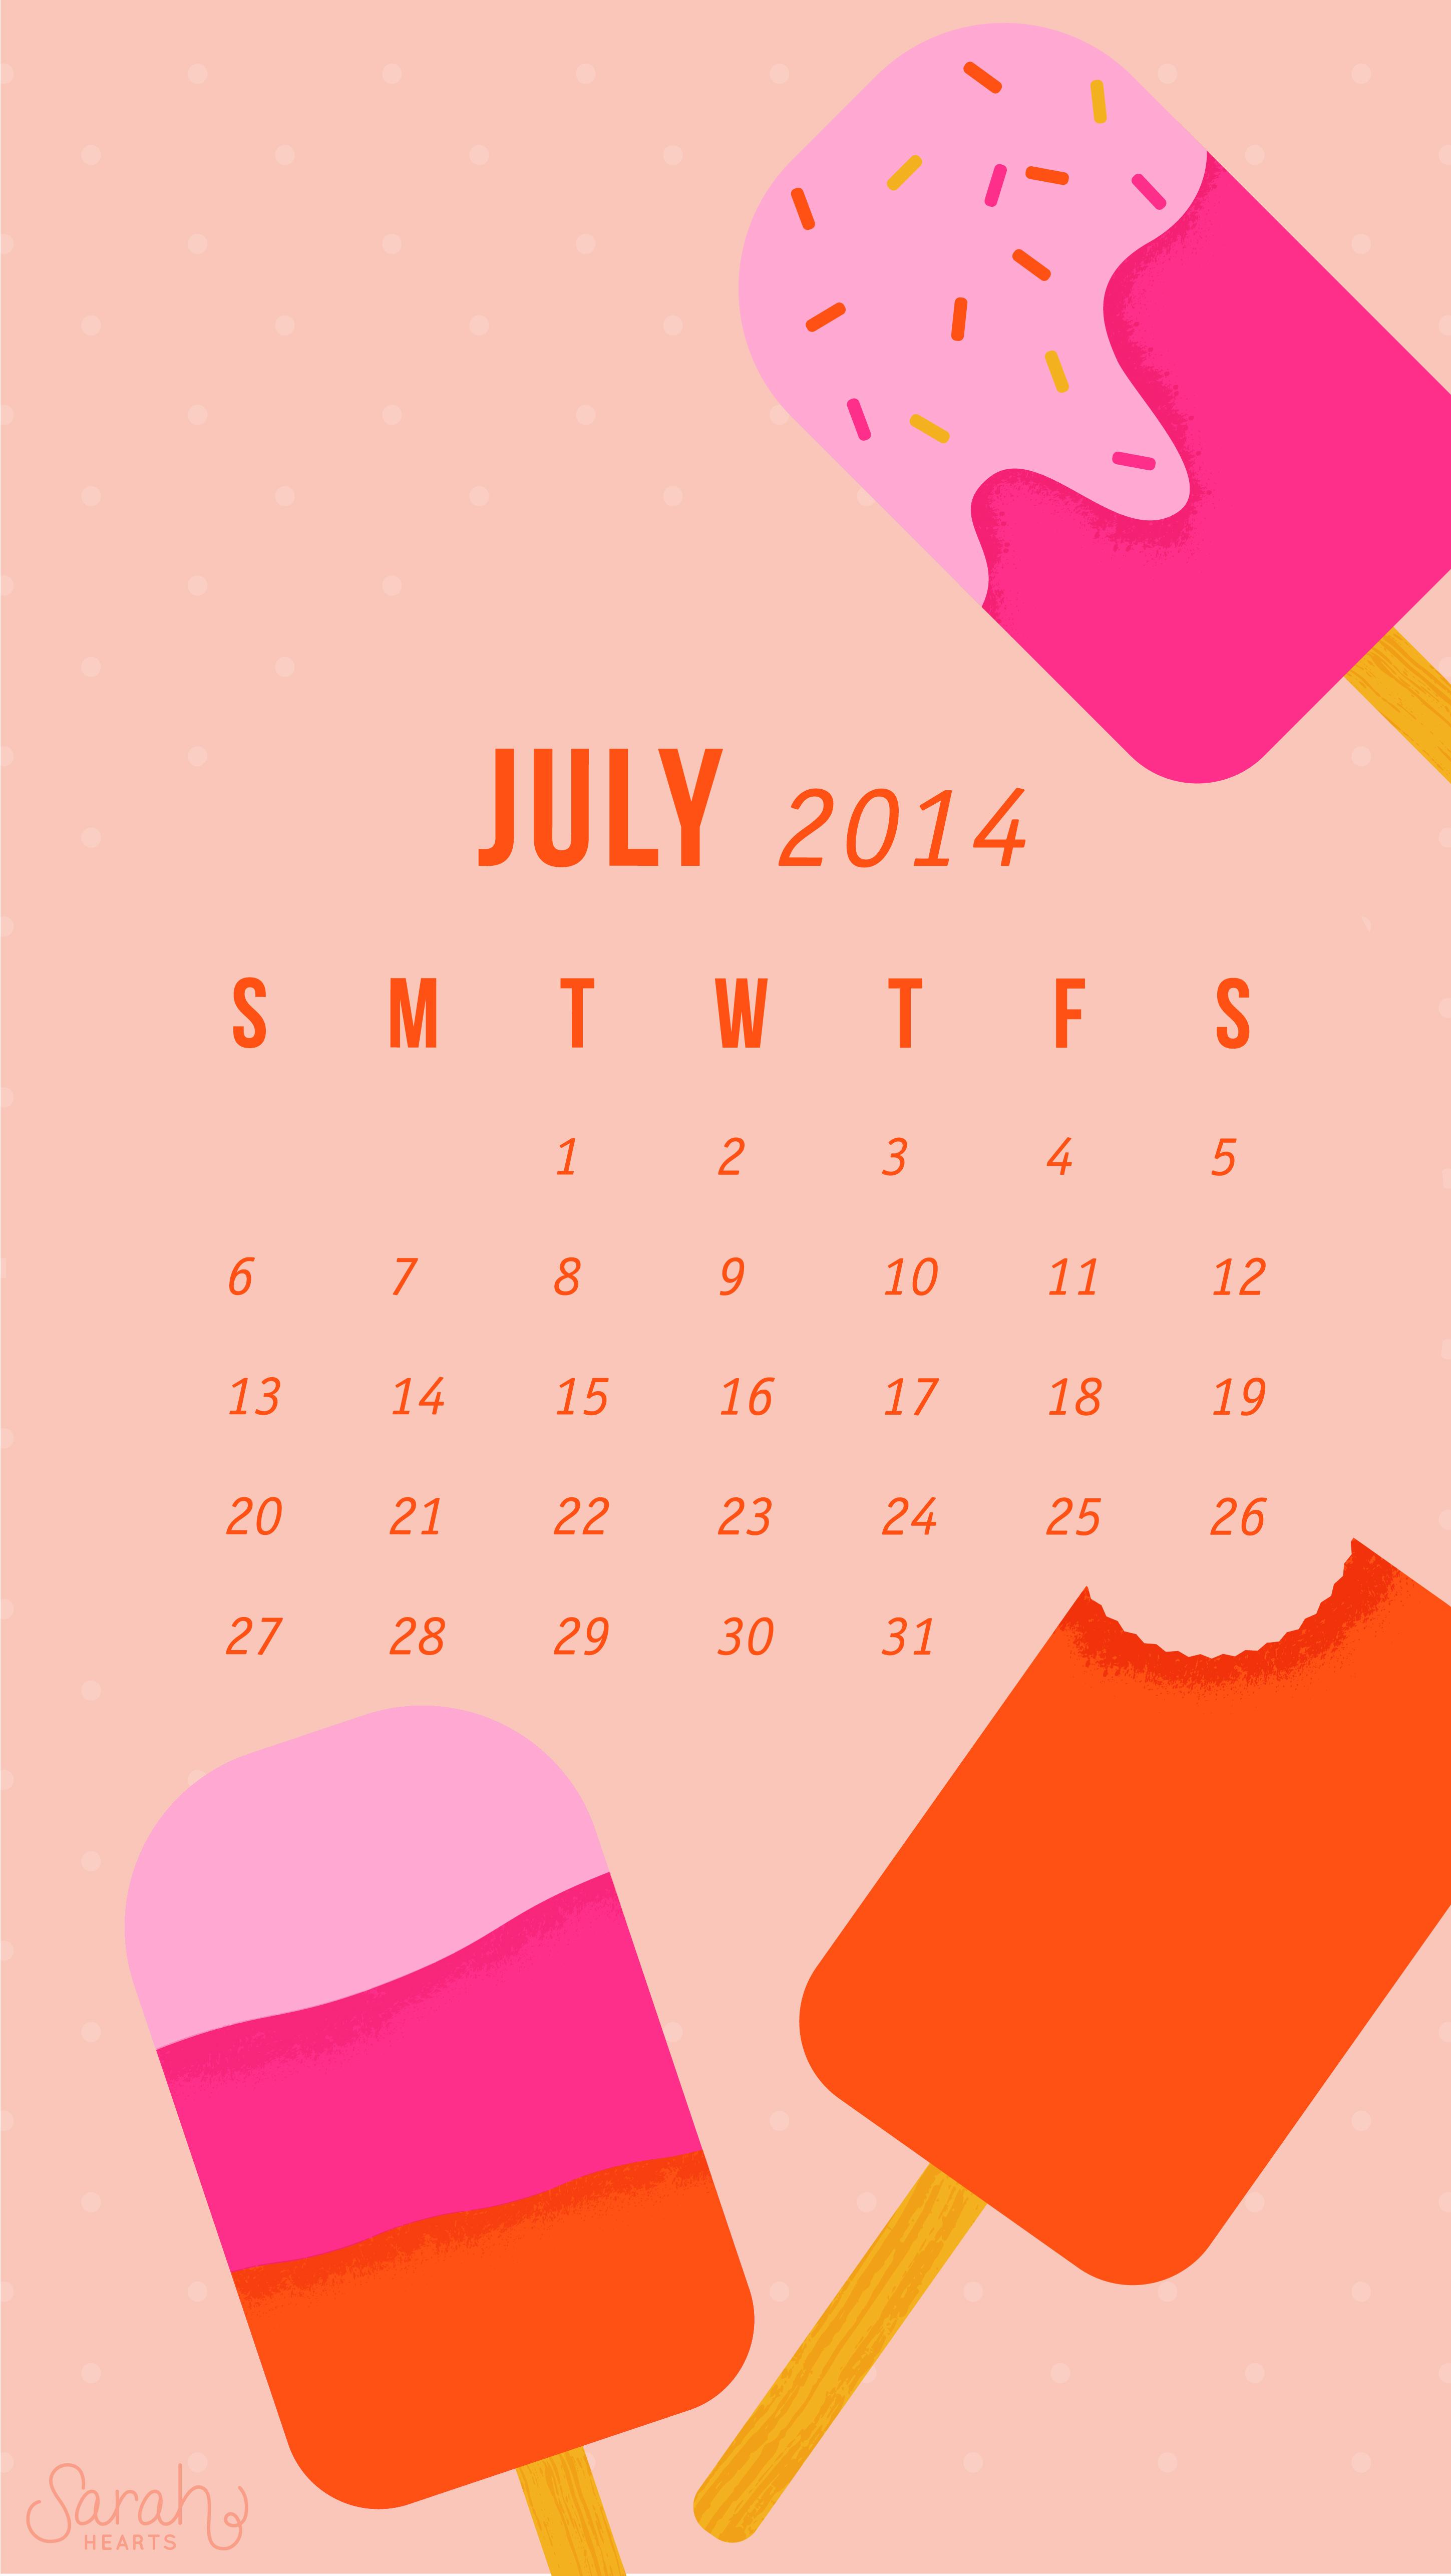 Cute Popsicle Wallpaper July 2014 Calendar Wallpaper Sarah Hearts